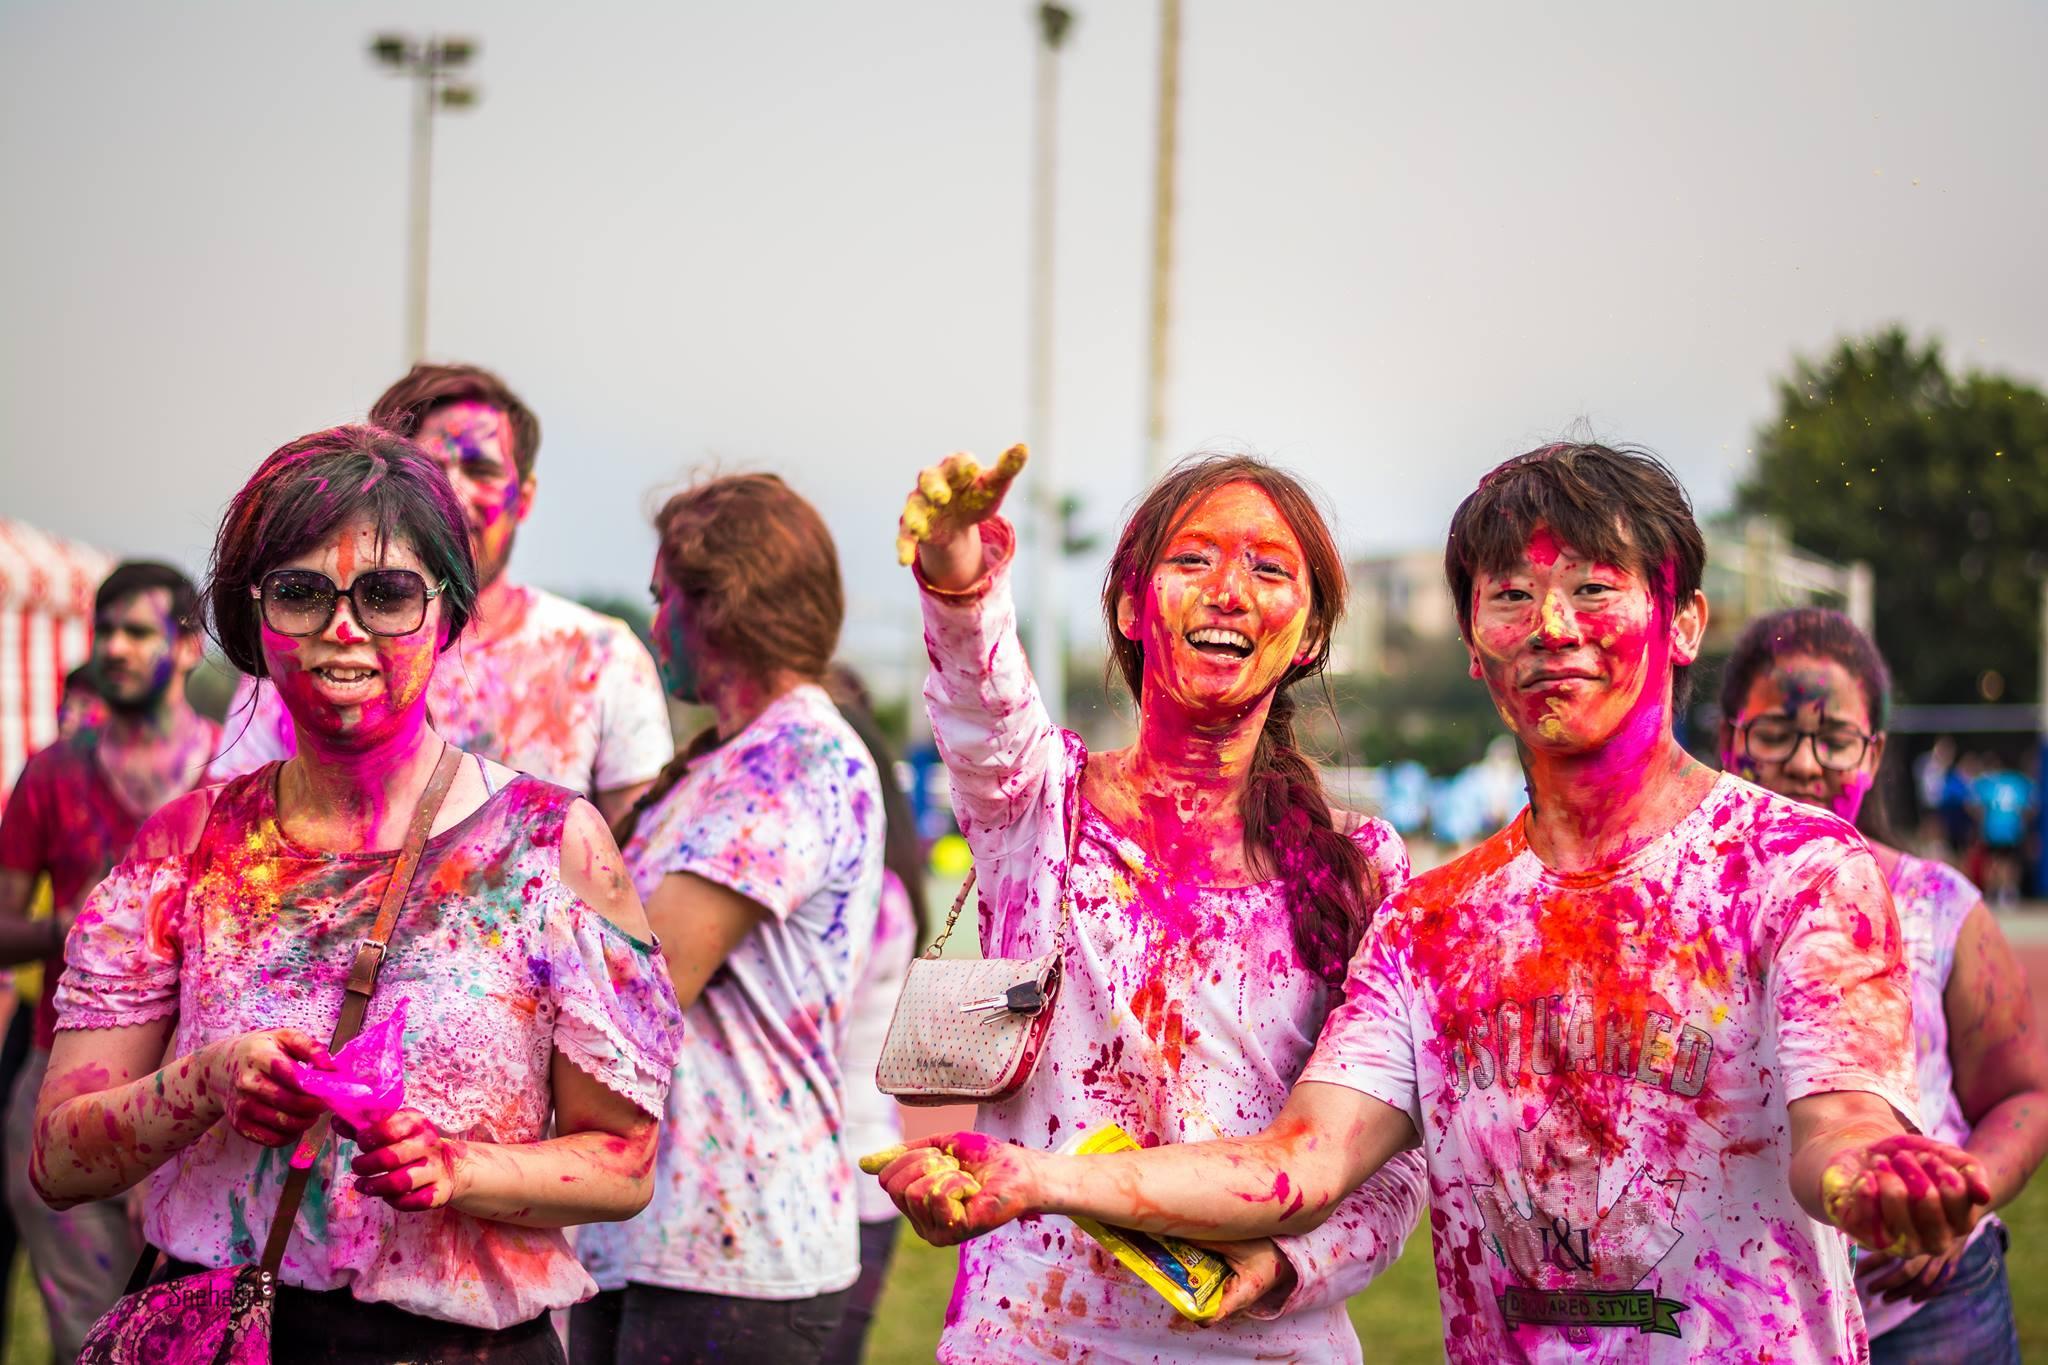 Holi festival revelers covered in colored powder. (Photo by Mayur Srivastava)